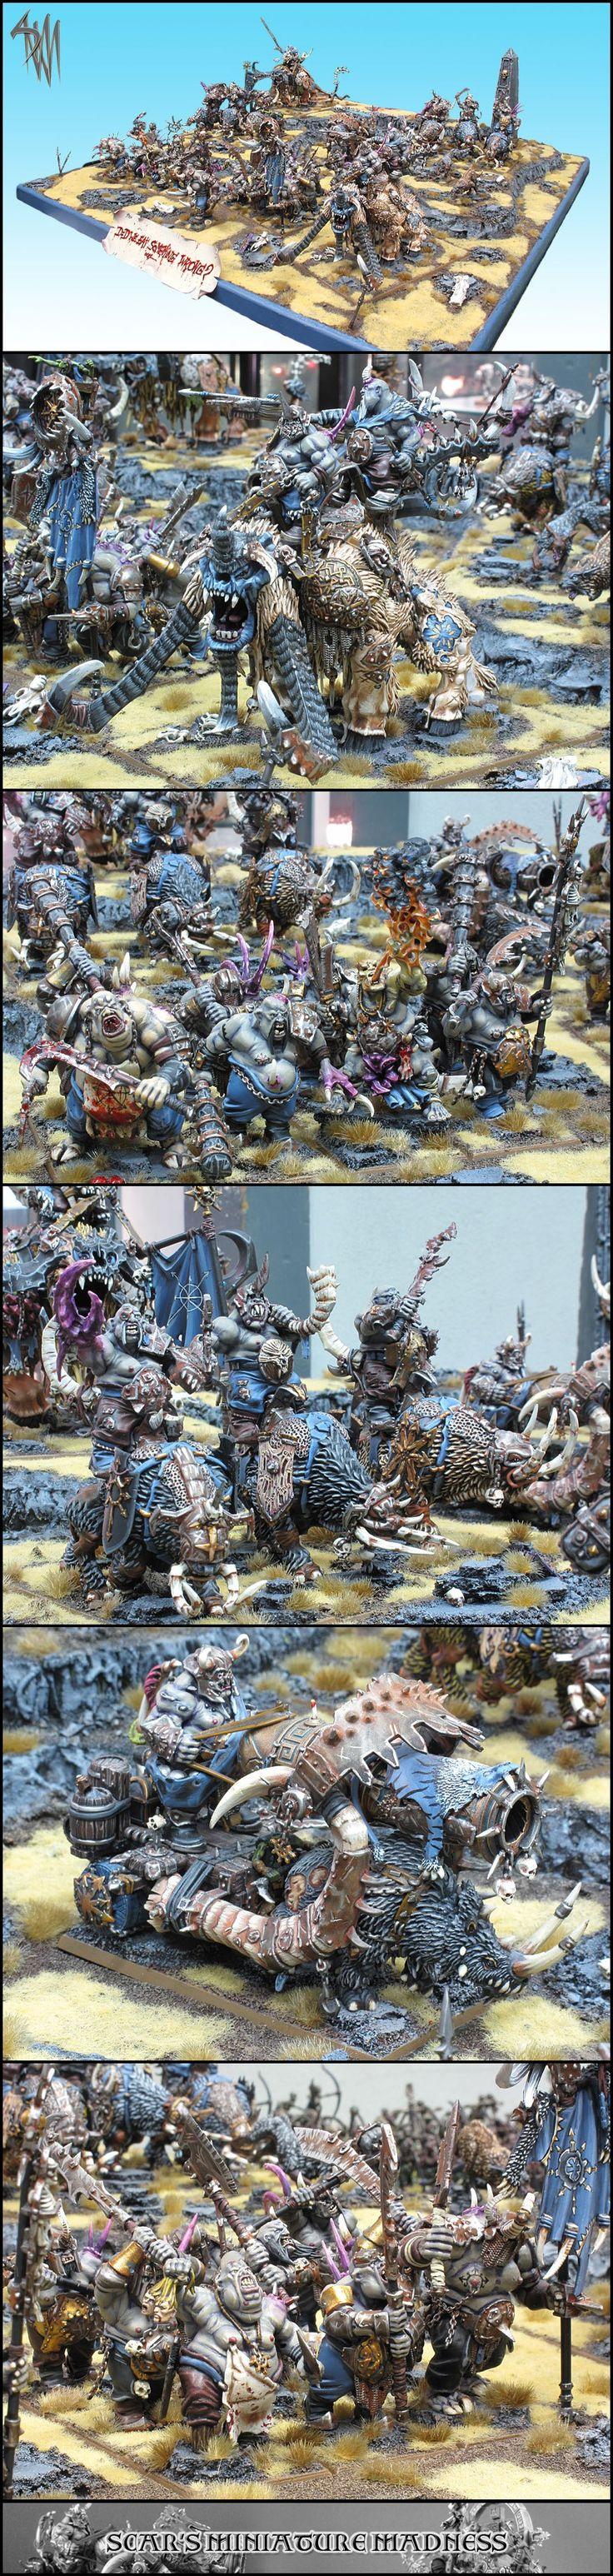 And Winner Is >> Winner Of Armies On Parade 2012 Netherlands | warhammer ogor kingdom | Pinterest | Miniaturas y ...